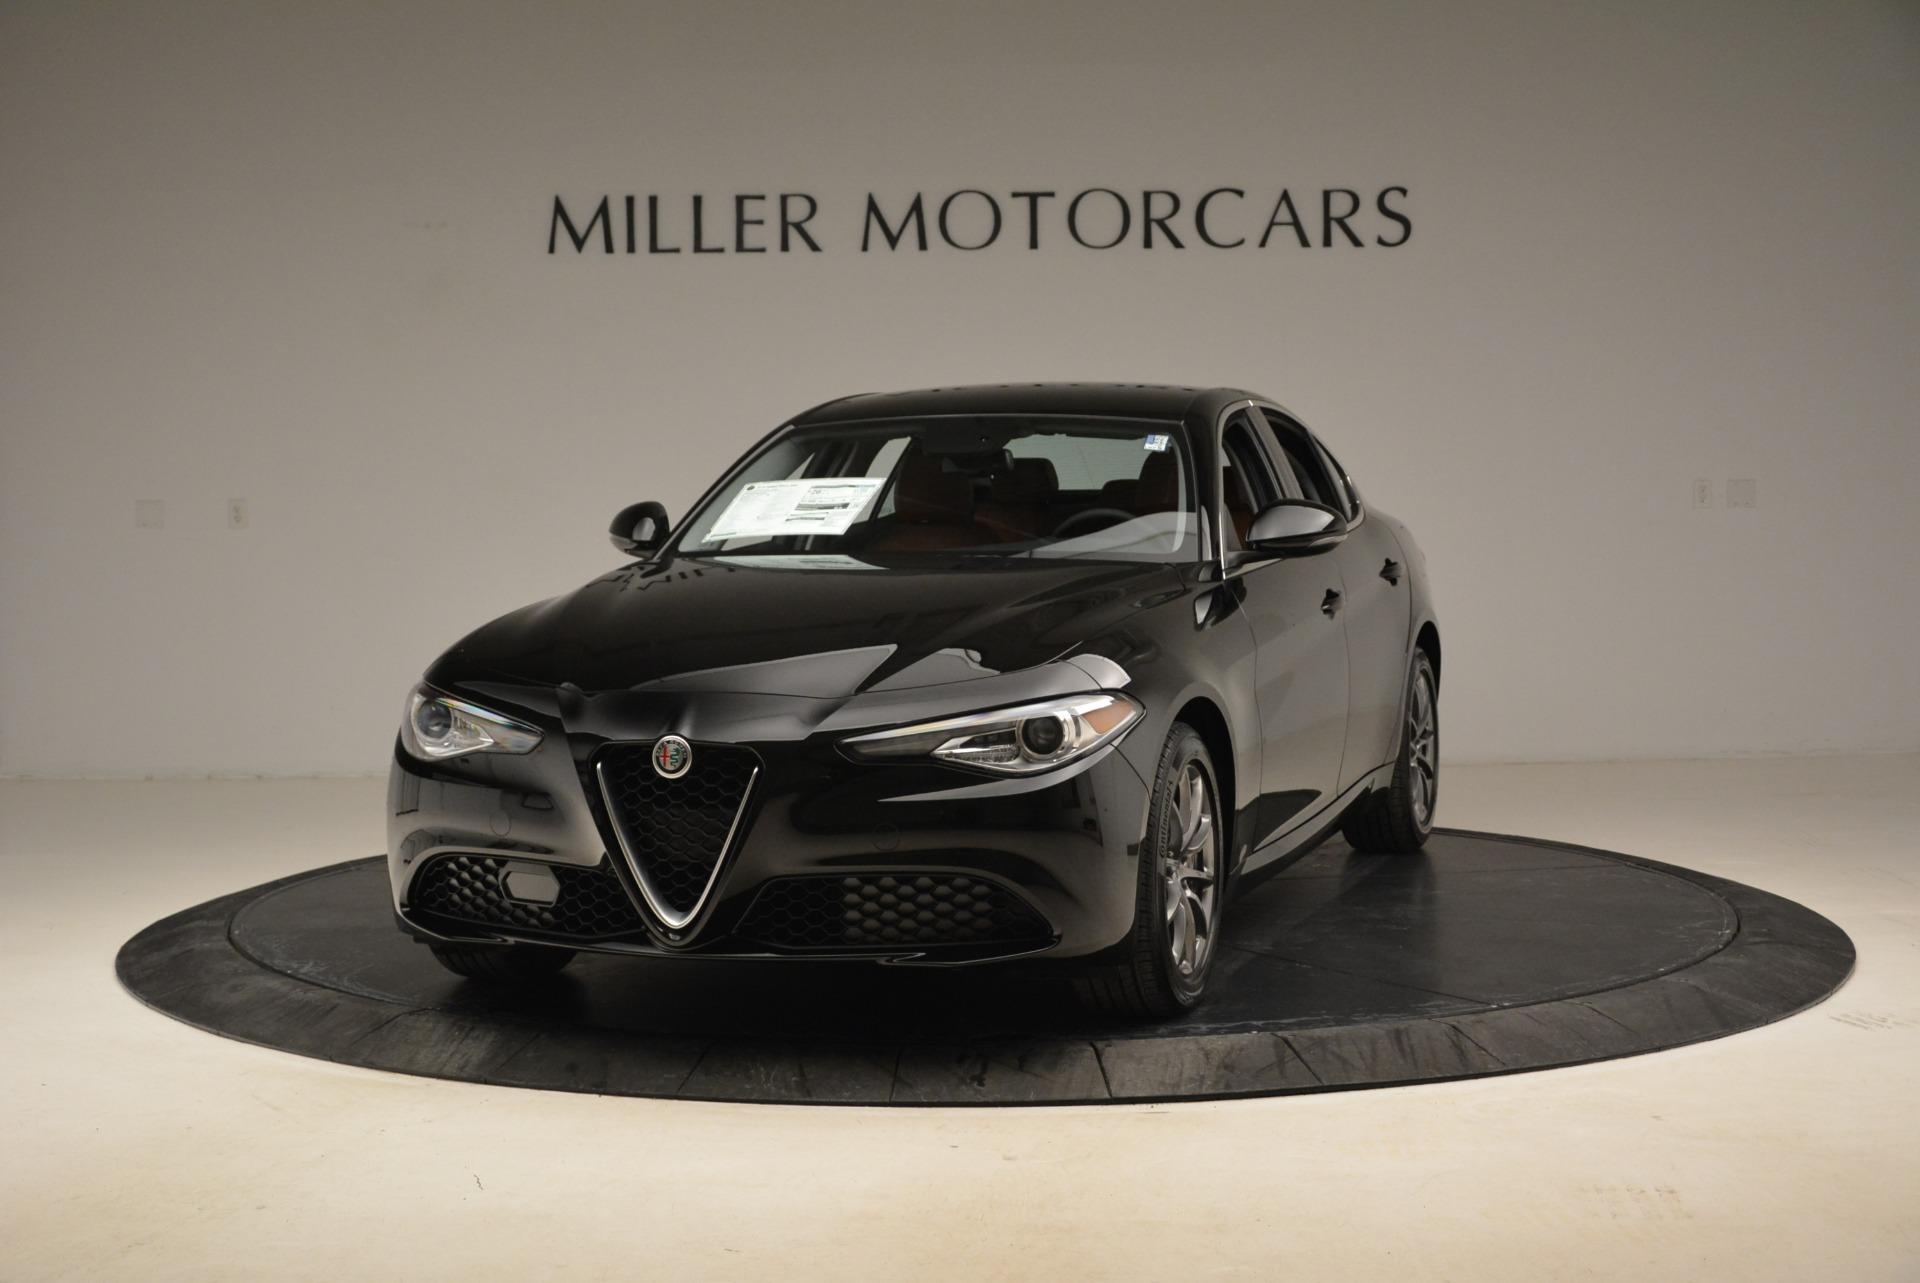 New 2018 Alfa Romeo Giulia Q4 for sale Sold at Bentley Greenwich in Greenwich CT 06830 1